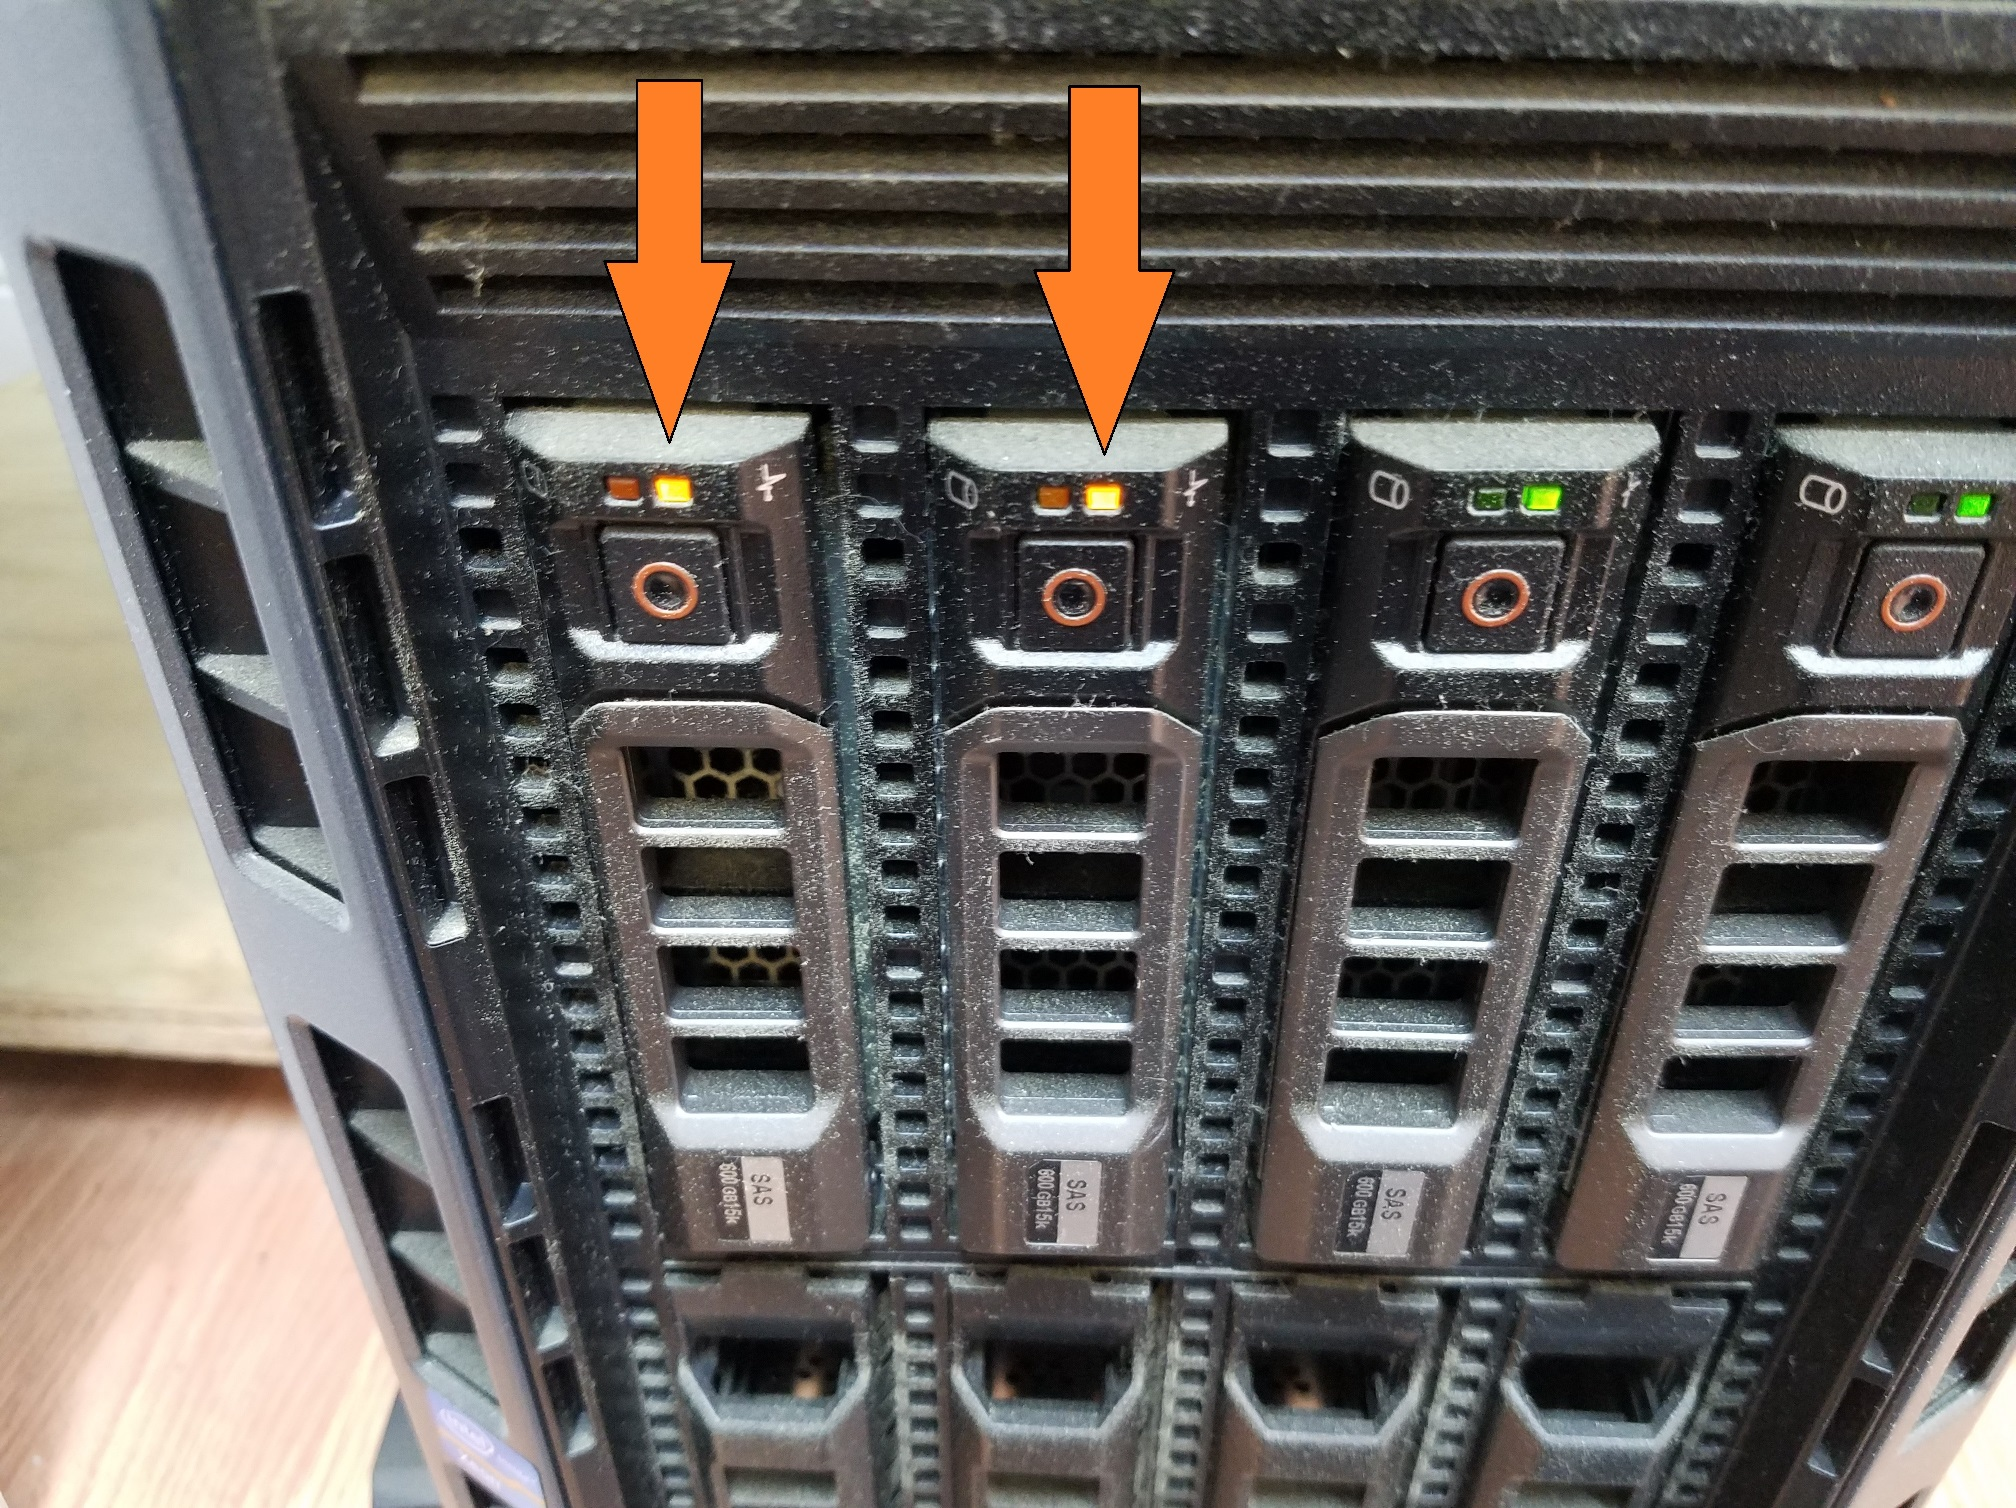 Dell server - Hard drive warning LED